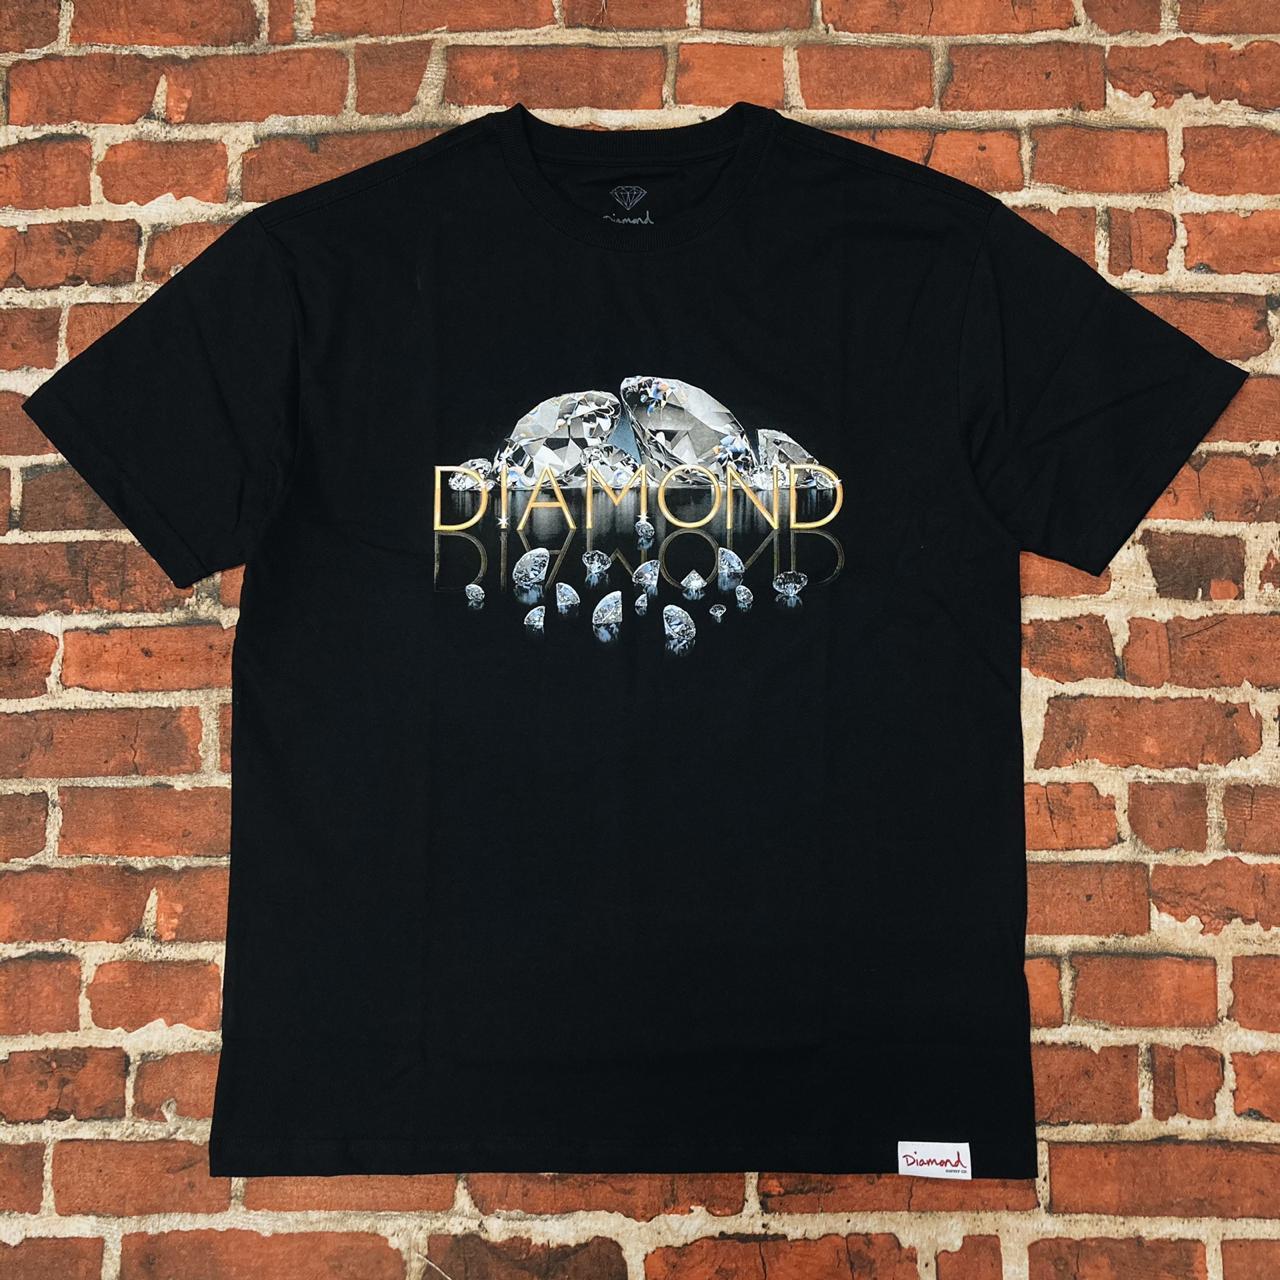 Camiseta diamond mirrored black